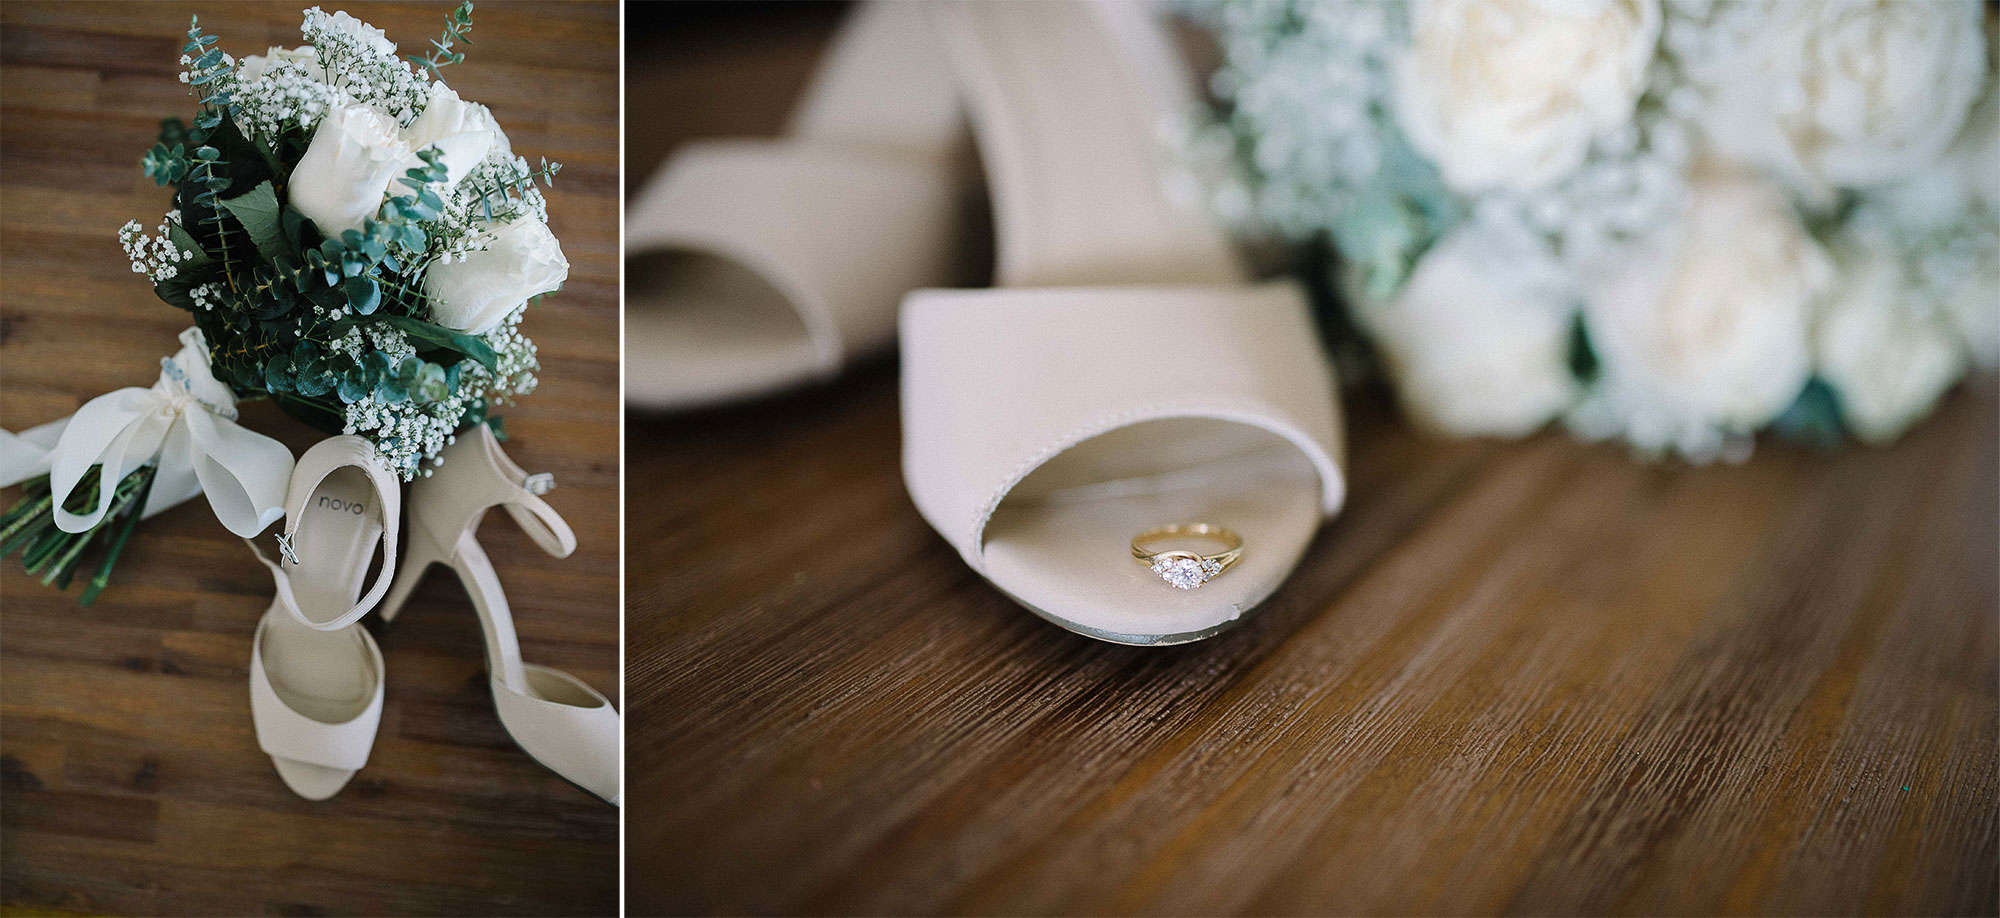 3-wedding photography perth amanda afton.jpg